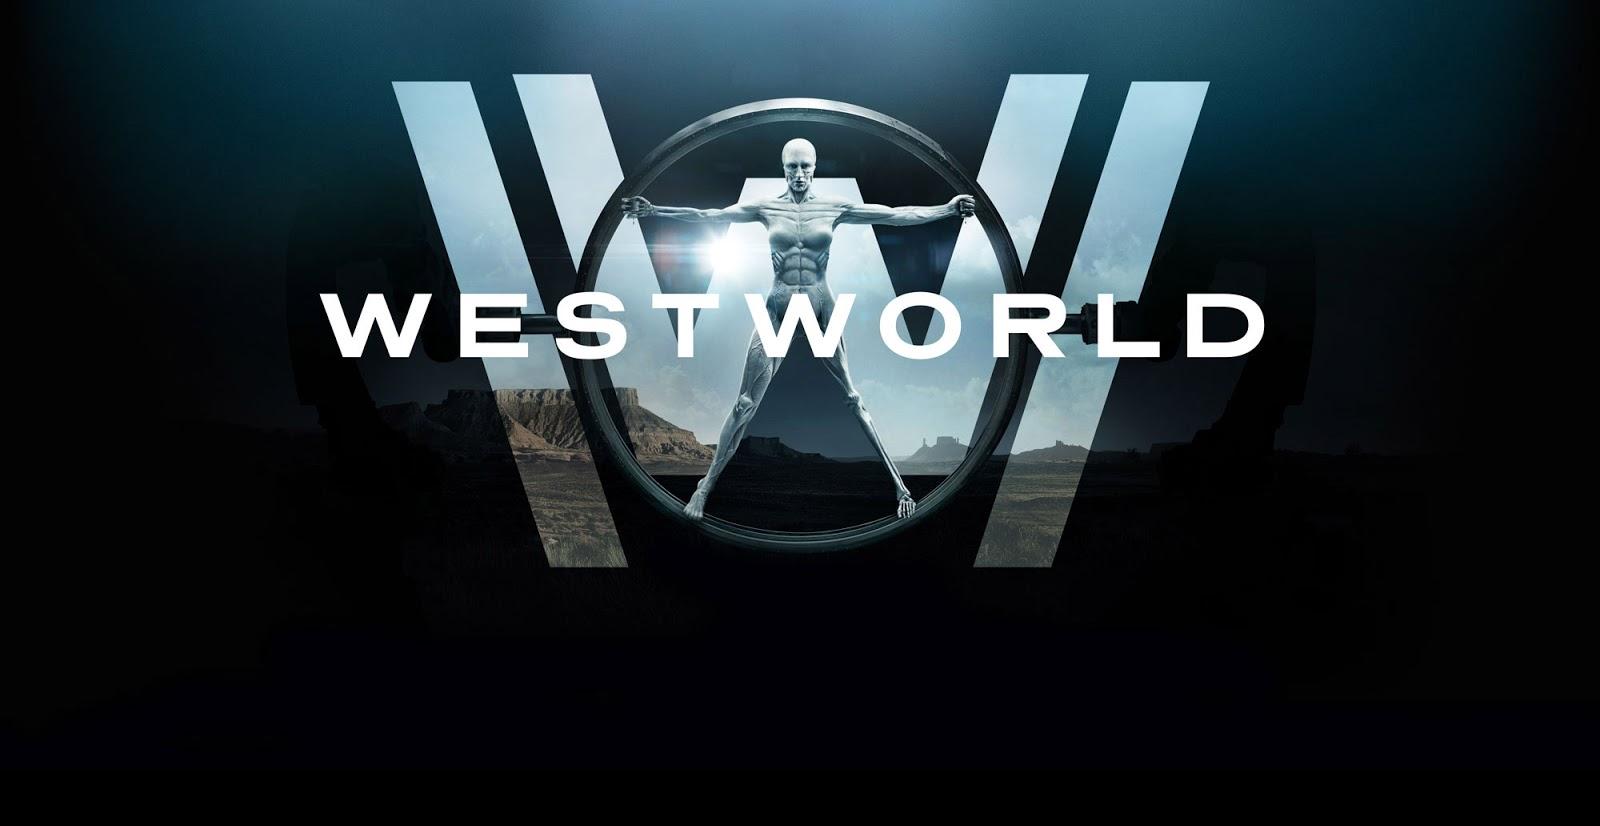 Póster de 'Westoworld'